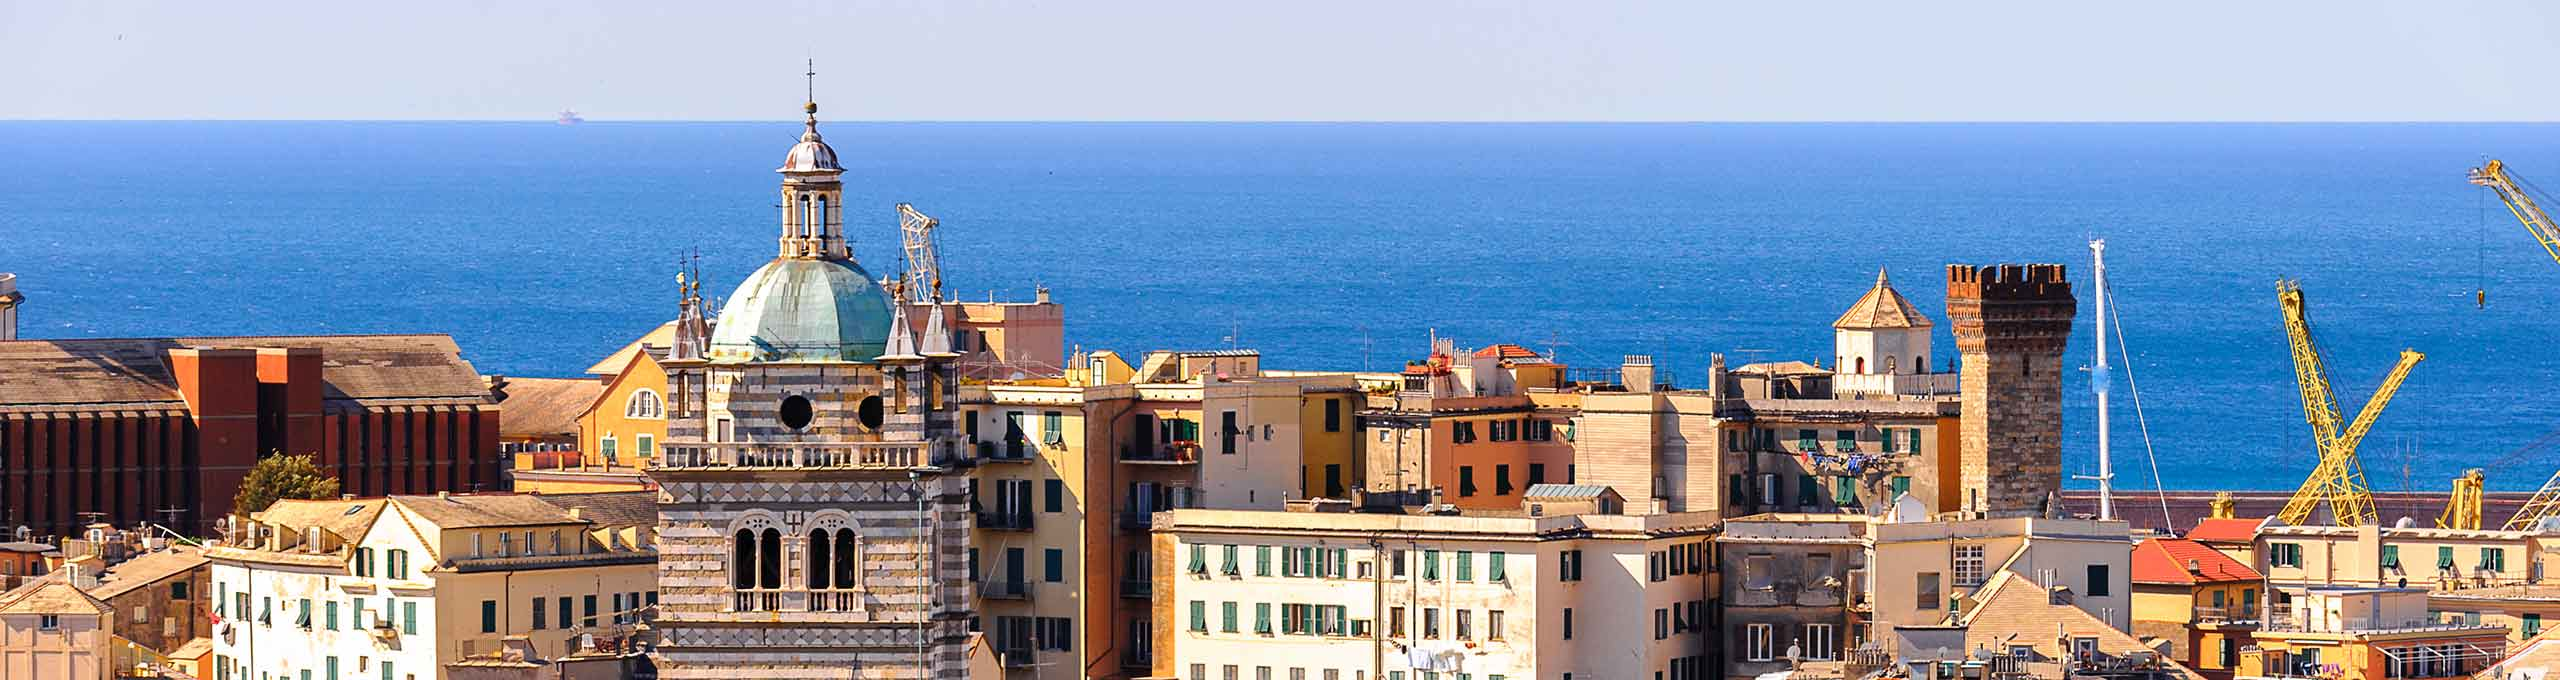 Genova, porto vecchio